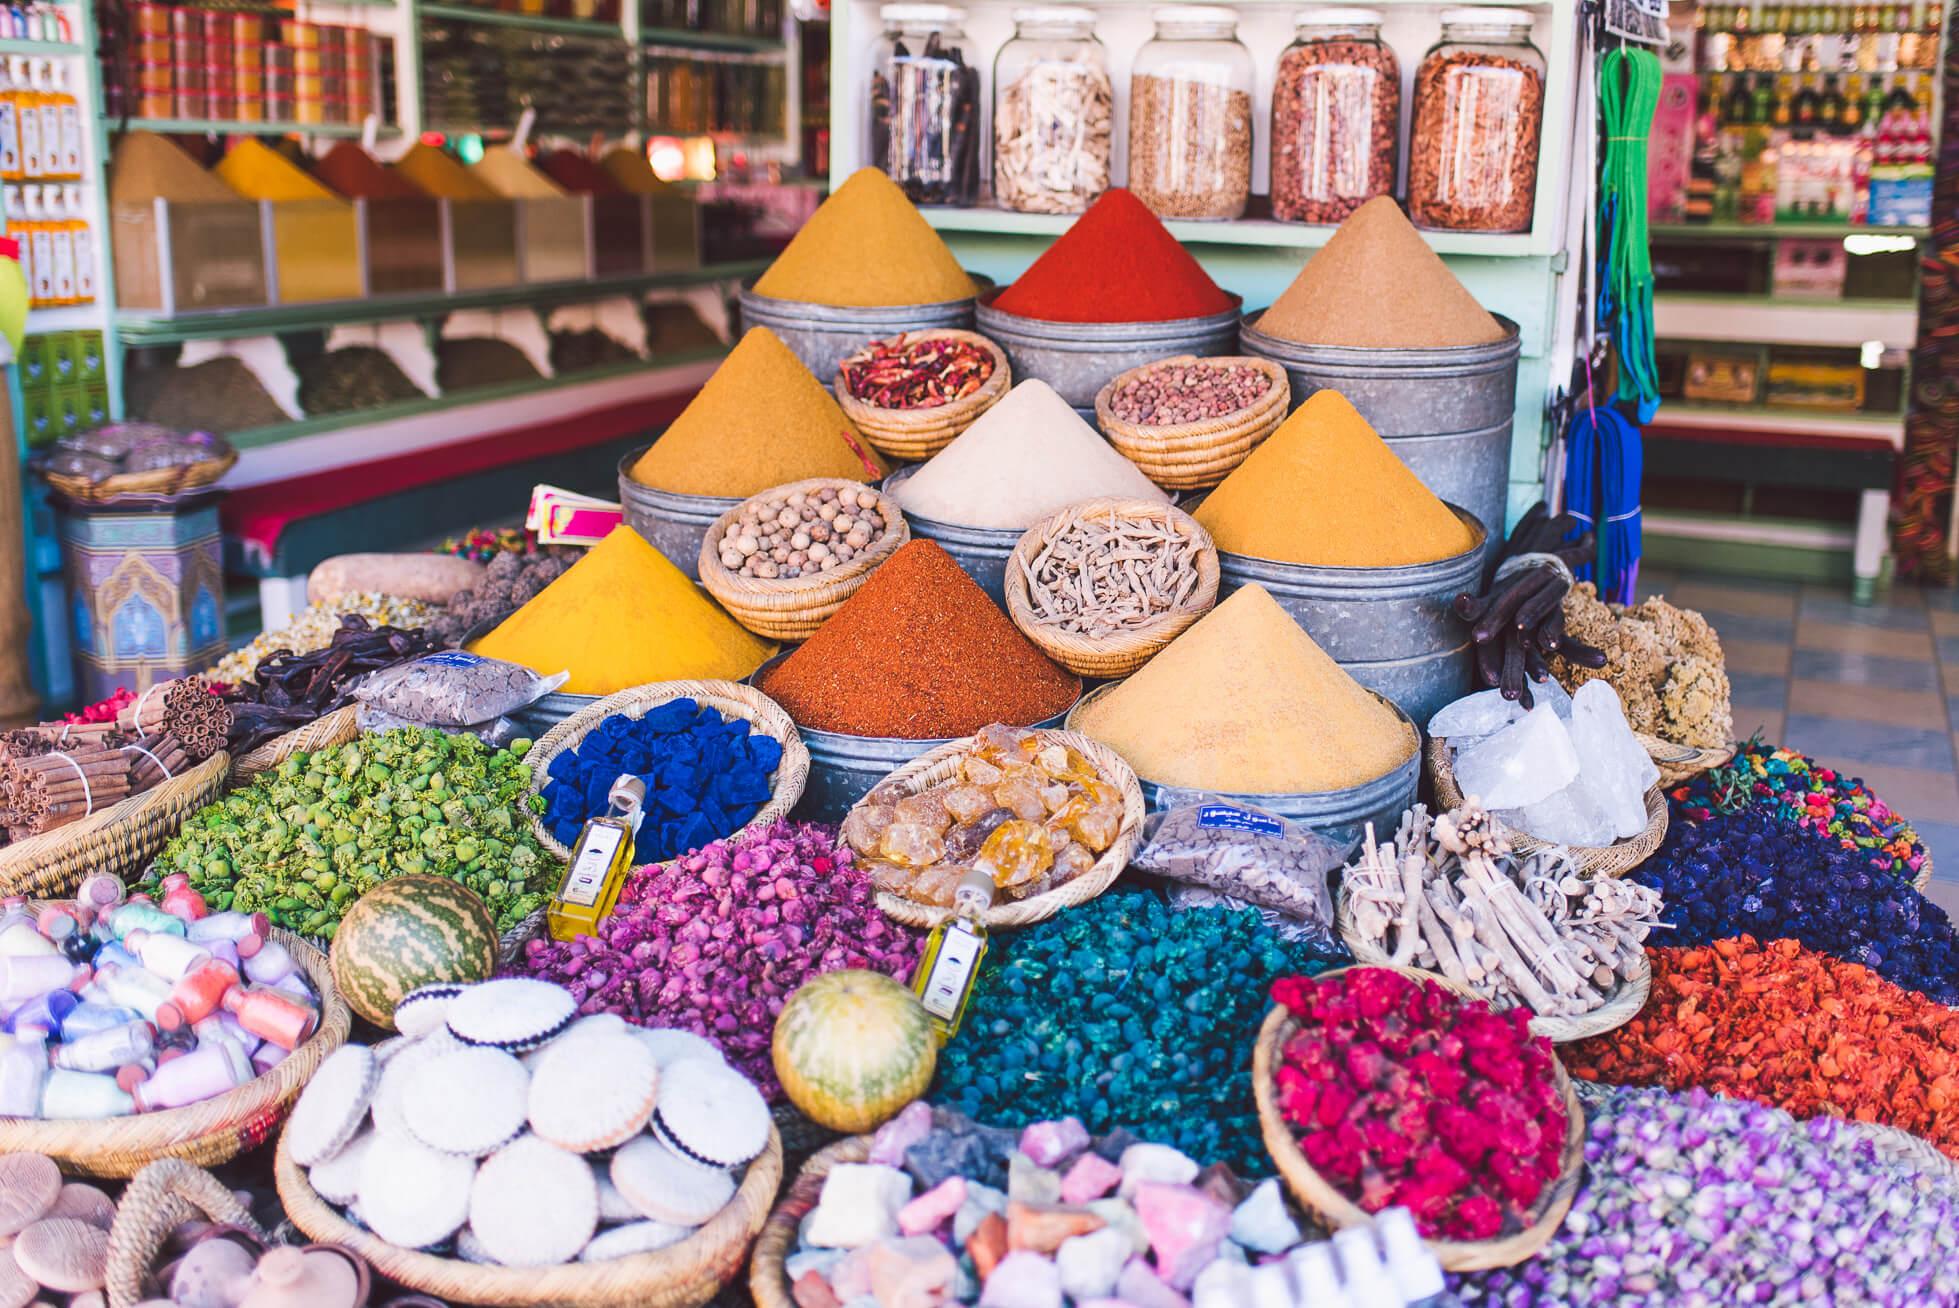 janni-deler-medina-marrakechDSC_0147